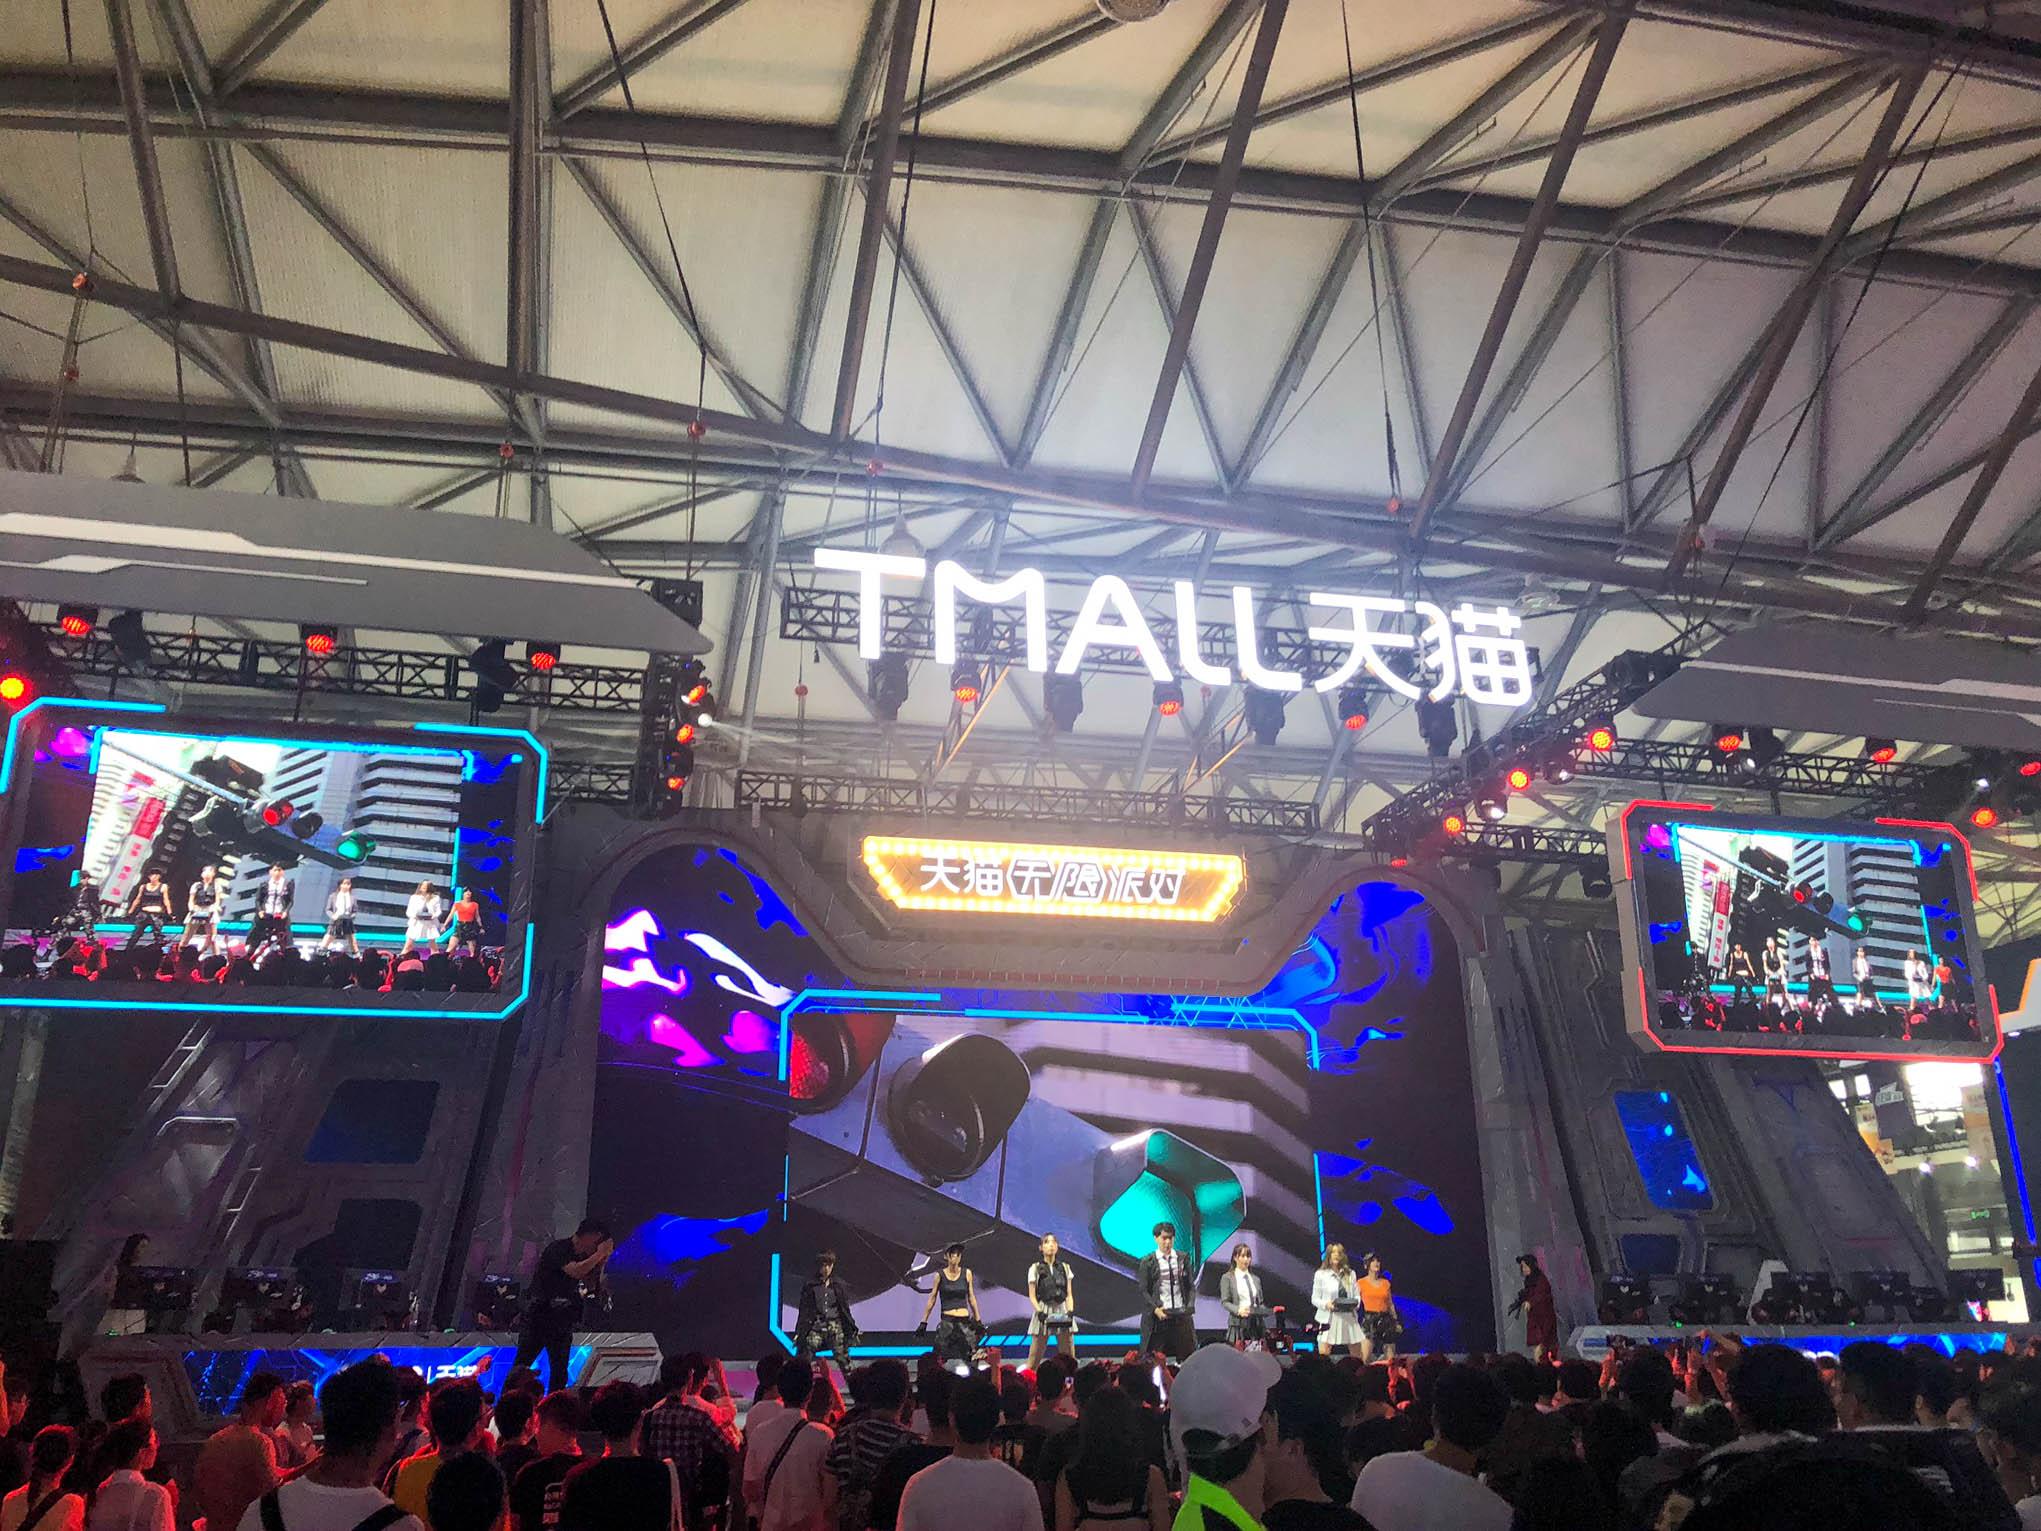 2019 ChinaJoy 中国国际数码互动娱乐展览会 游玩 第52张